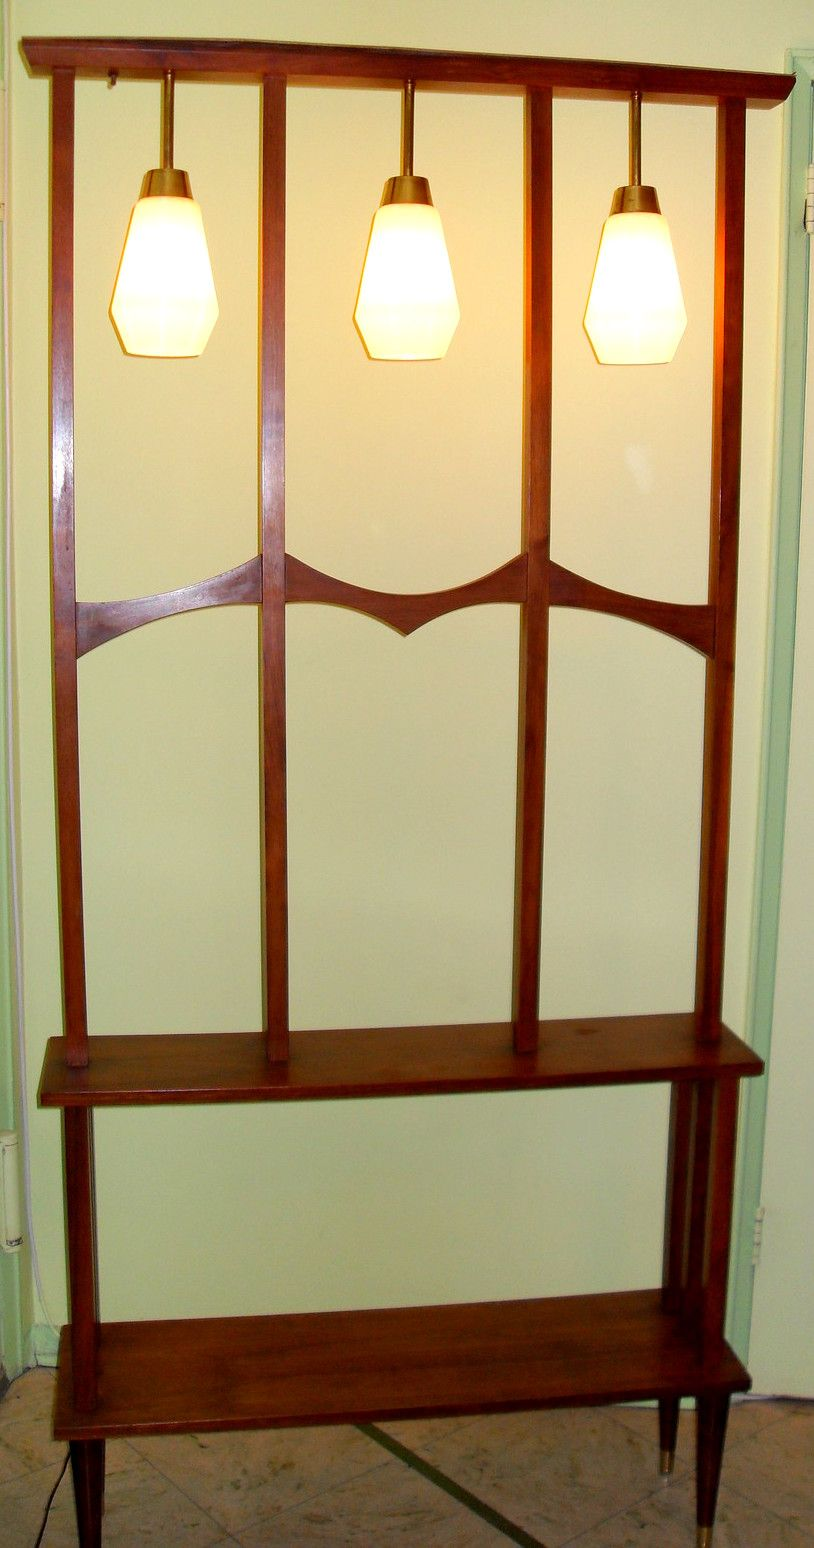 lighted room divider shelf mad for mid century room dividers pinterest room divider. Black Bedroom Furniture Sets. Home Design Ideas